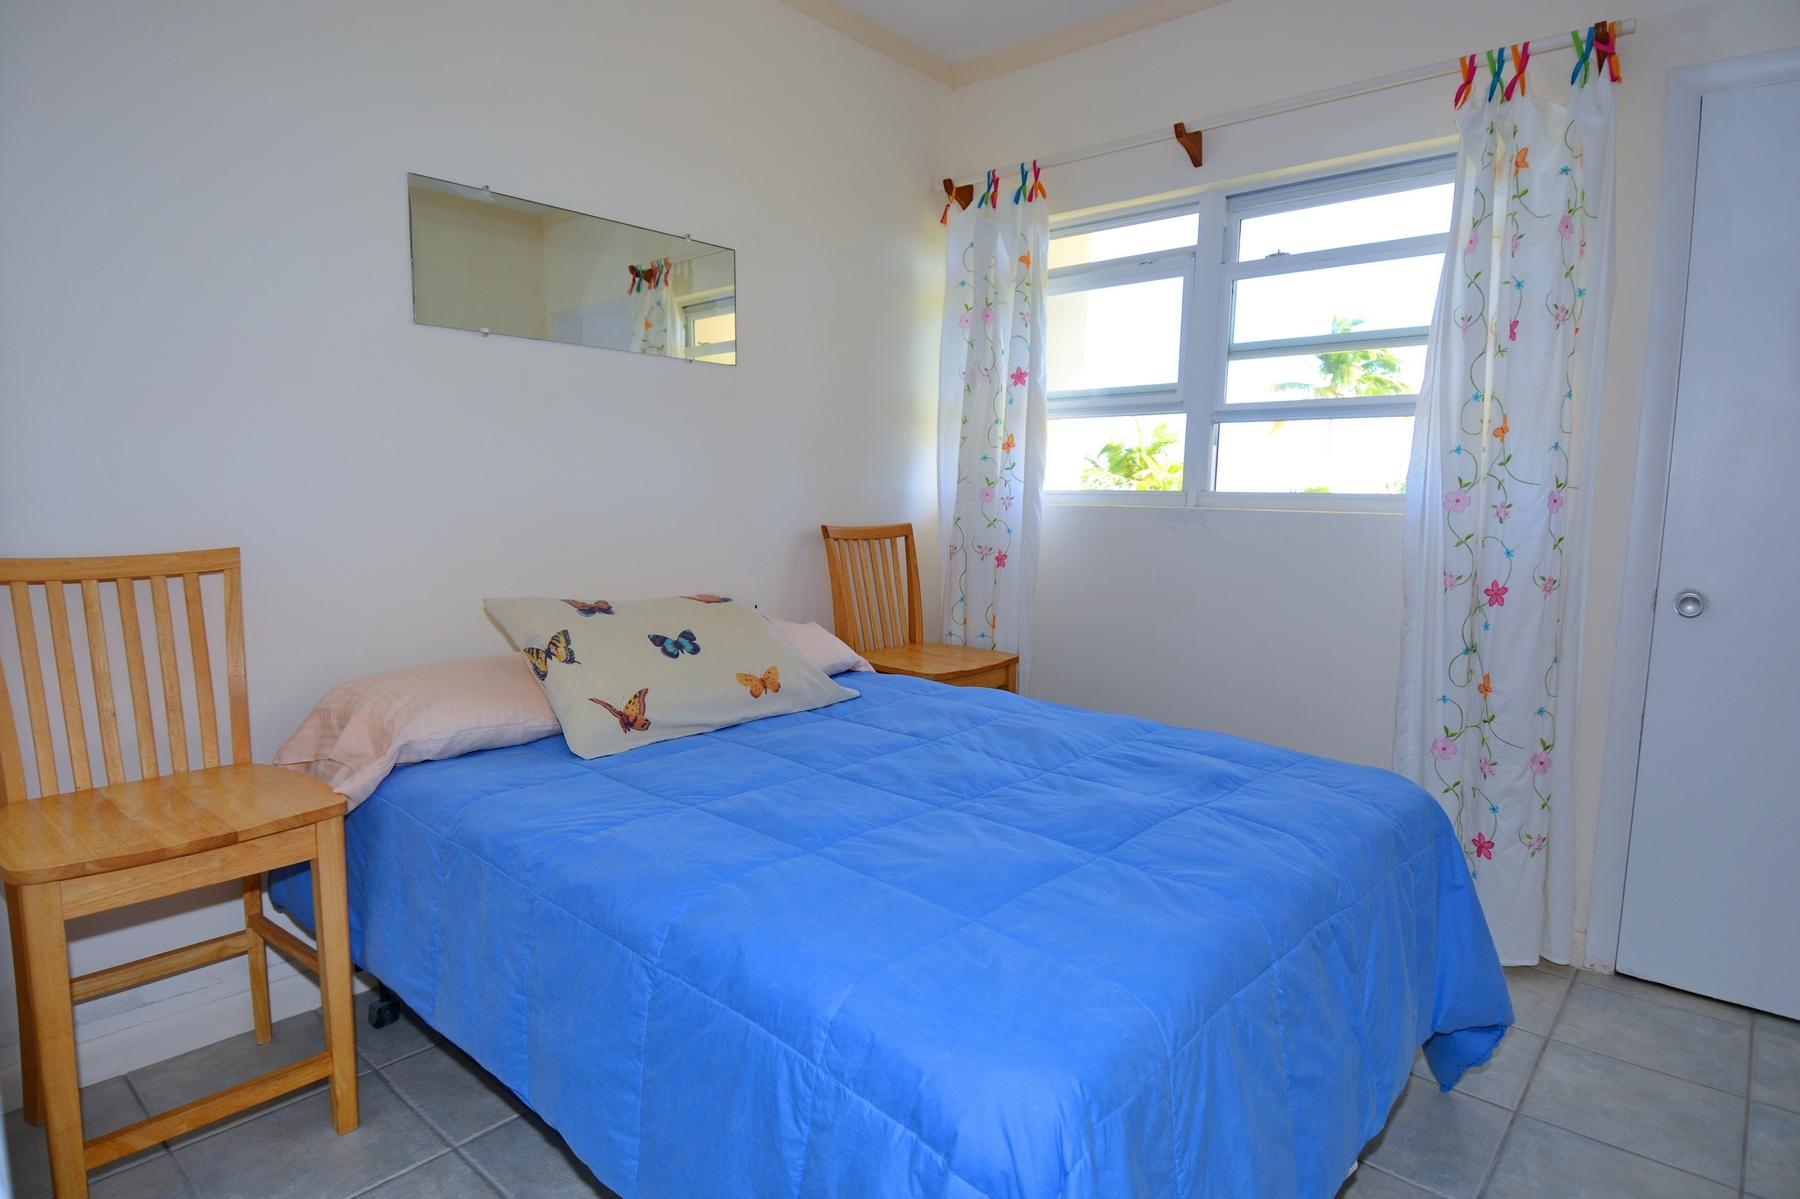 Additional photo for property listing at Oceans 5 Bahama Palm Shores, Abaco Bahamas